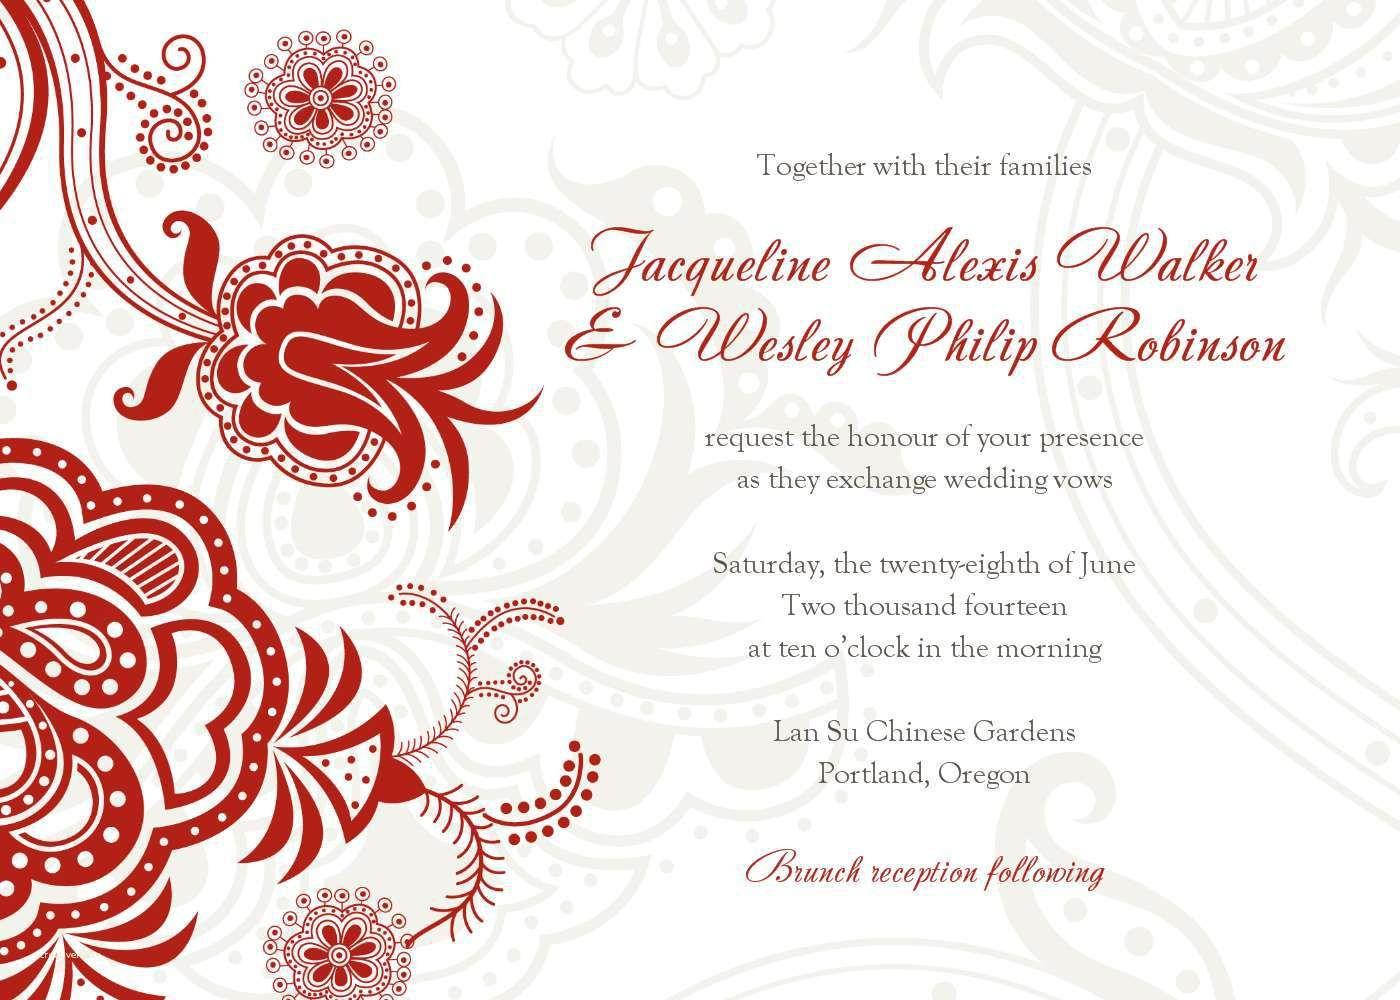 Elegant handmade wedding card designs 8 example pictures handmade wedding card designs elegant handmade wedding card designs wedding invitation card design invitation stopboris Gallery